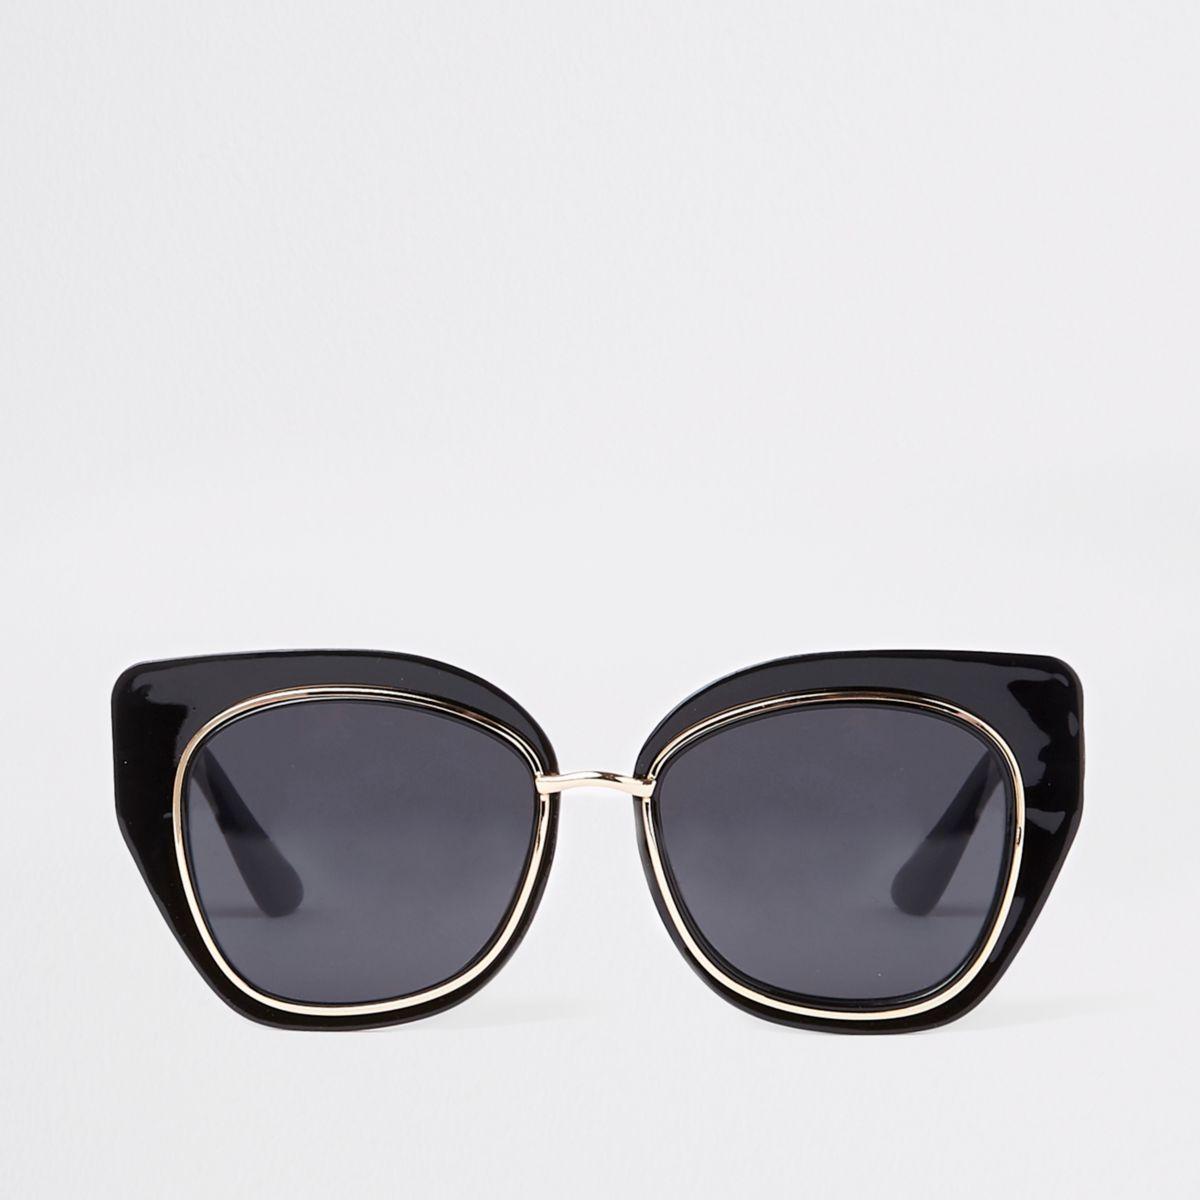 Zwarte glamoureuze plastic pilotenzonnebril